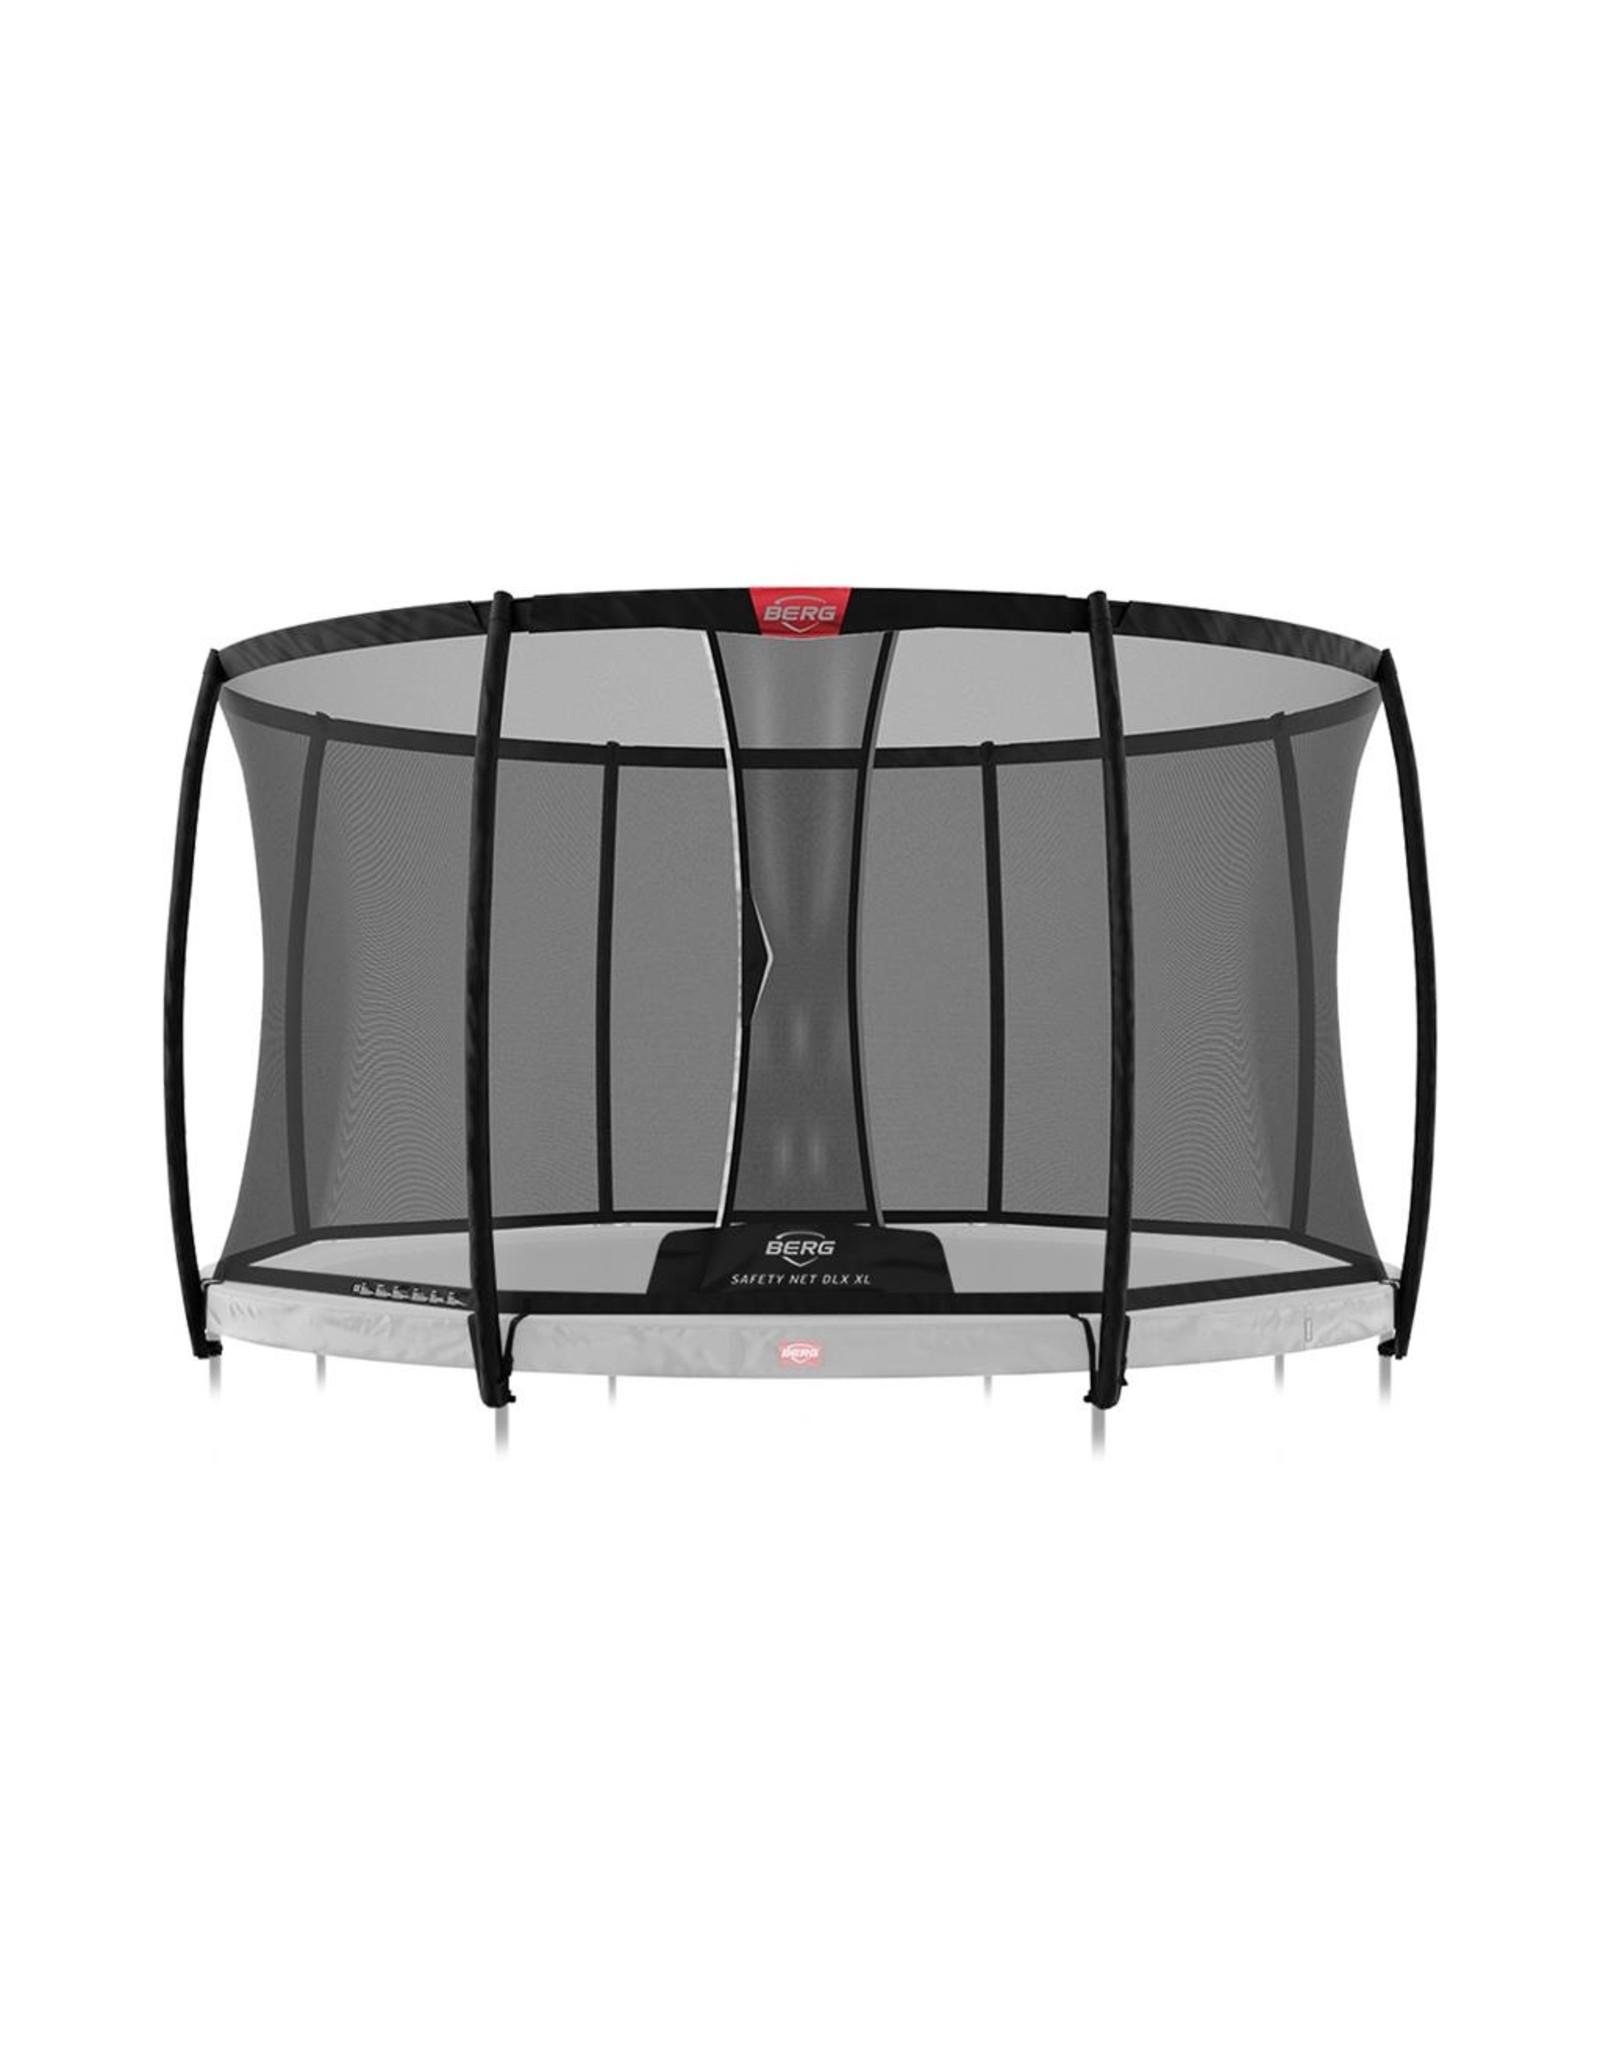 BERG BERG Safety Net DLX XL 430